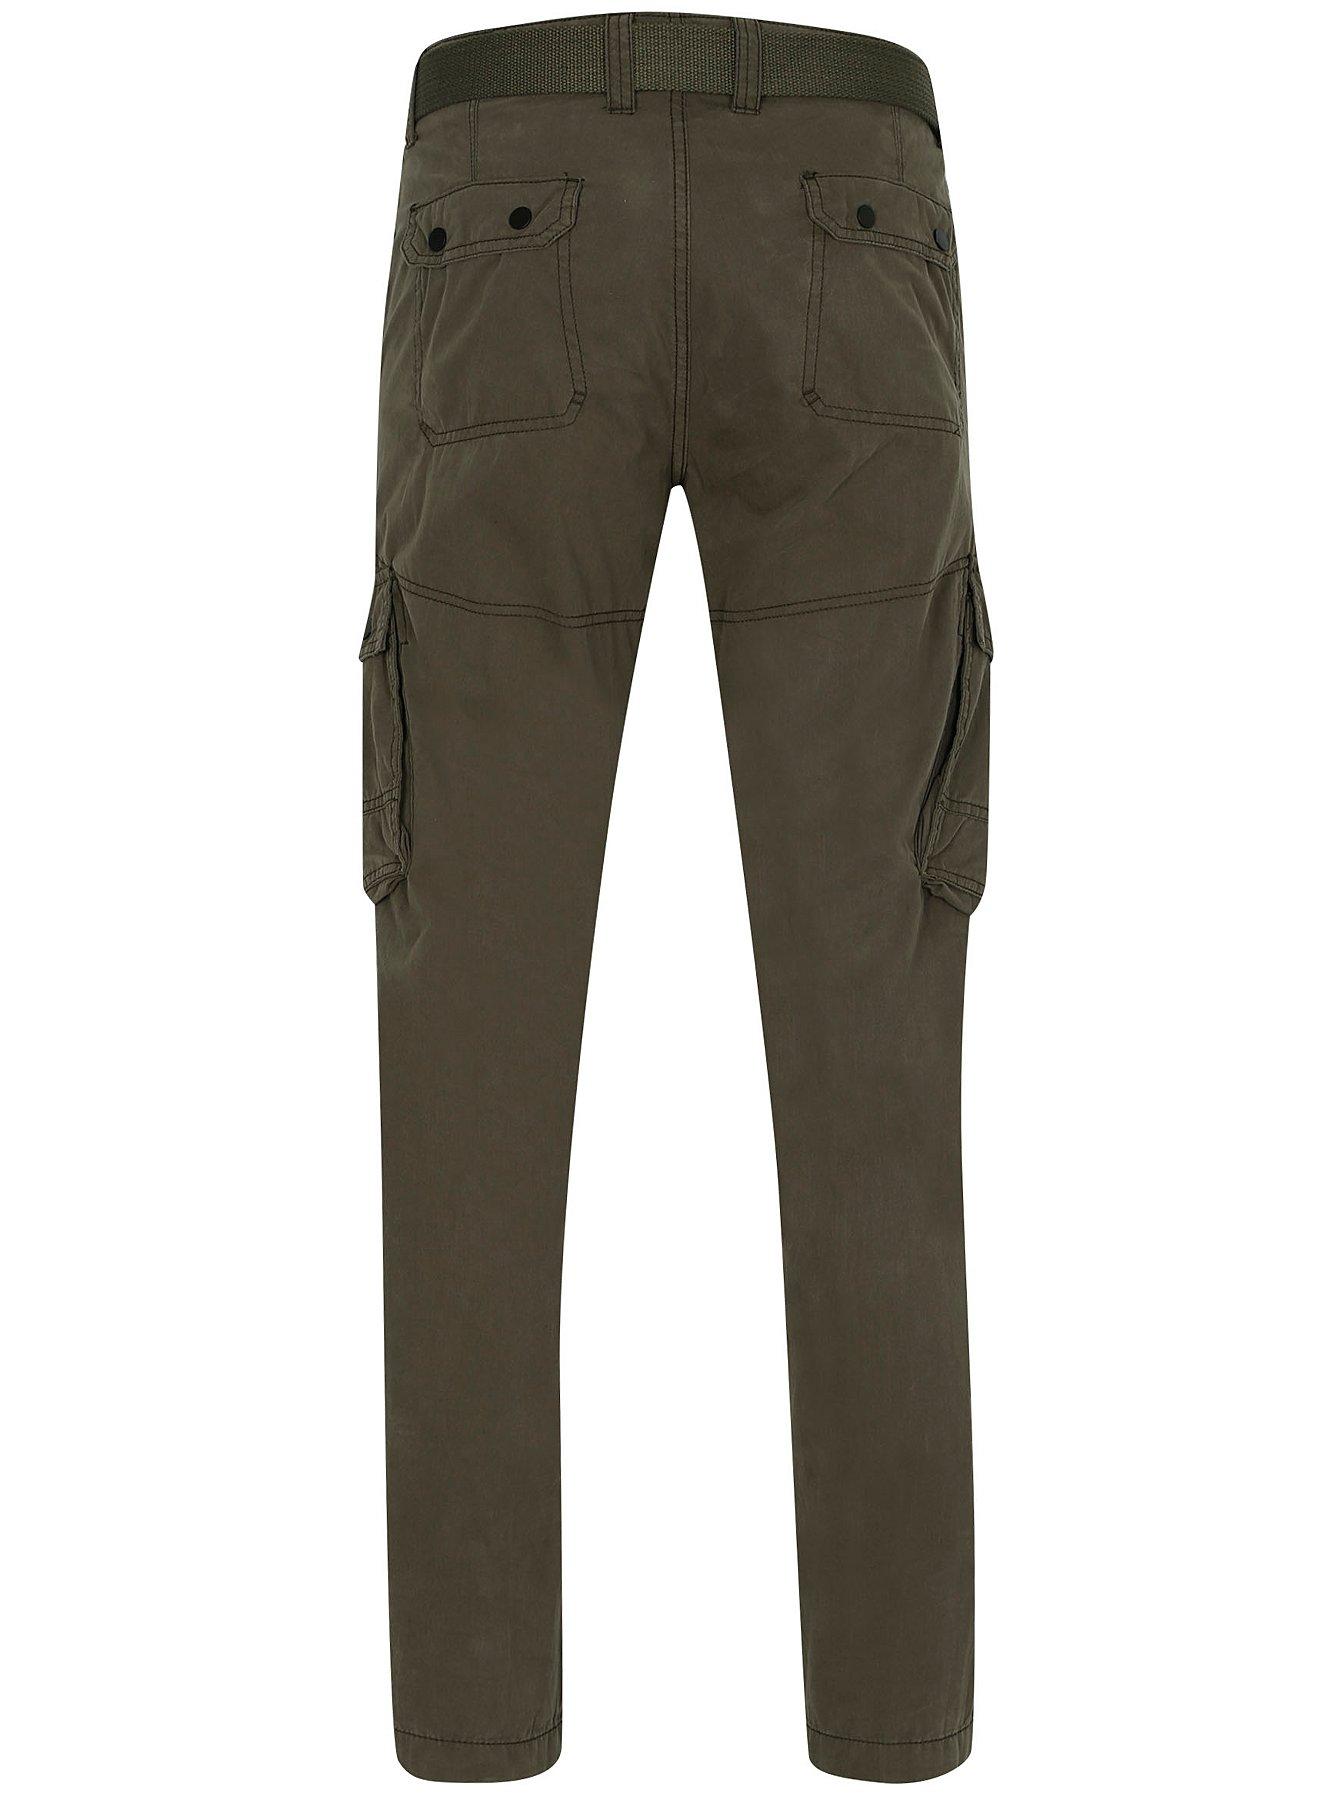 Cargo Trousers   Men   George at ASDA